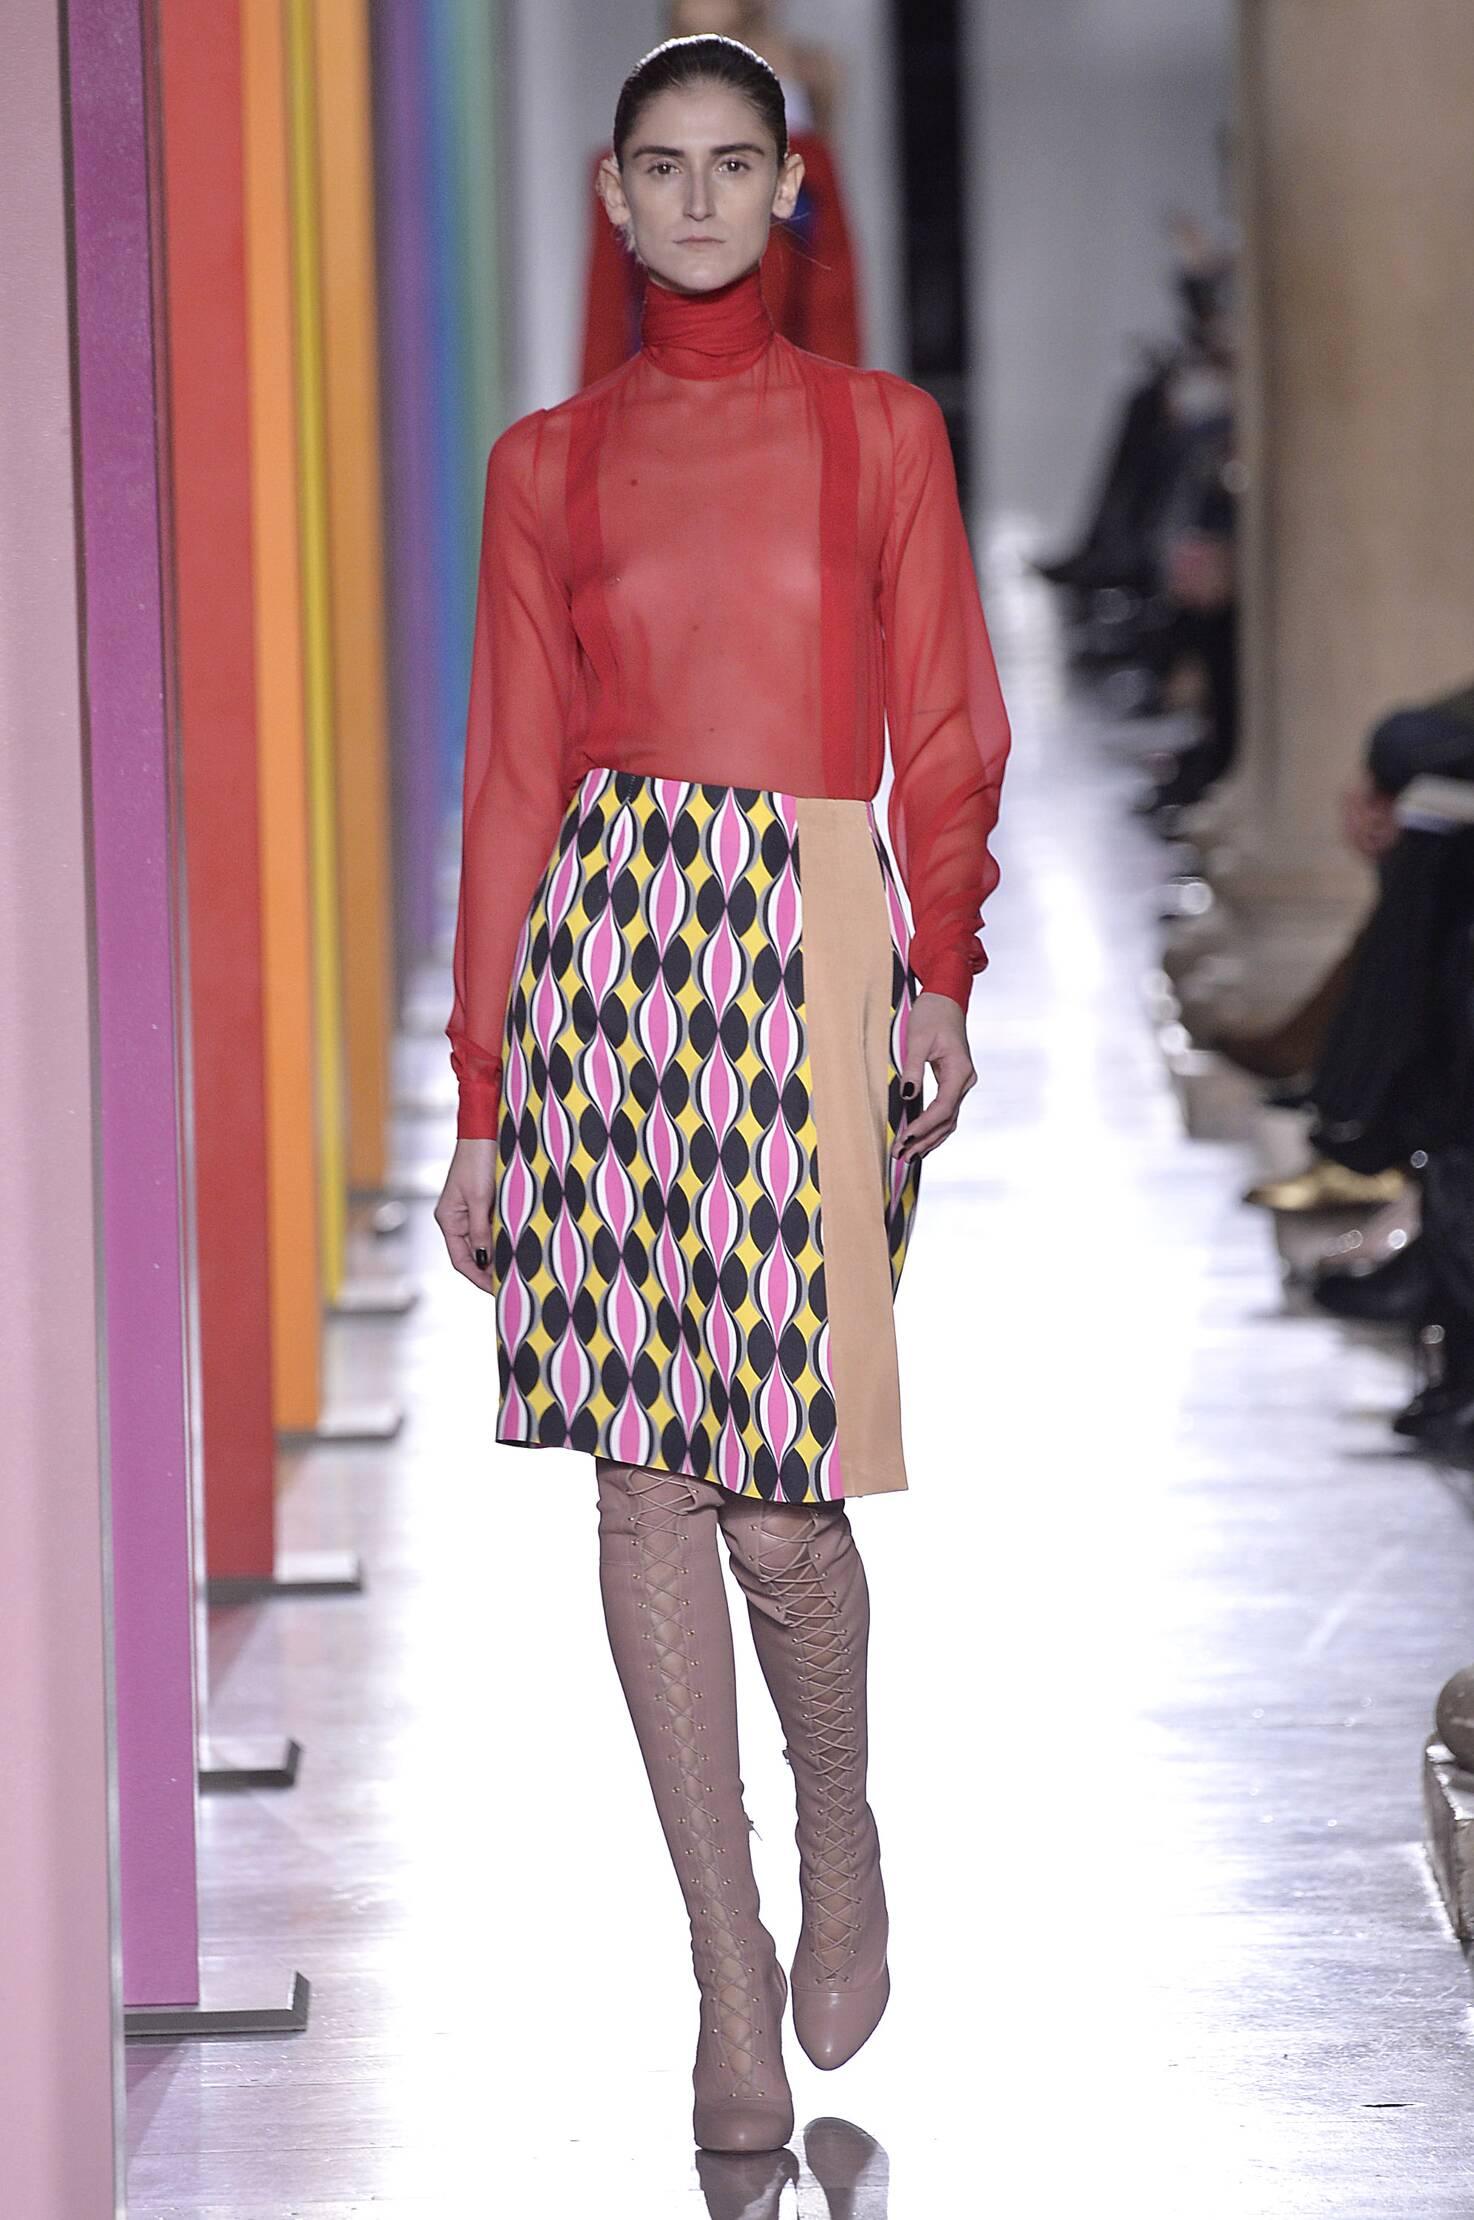 Catwalk Jonathan Saunders Fall Winter 2015 16 Women's Collection London Fashion Week